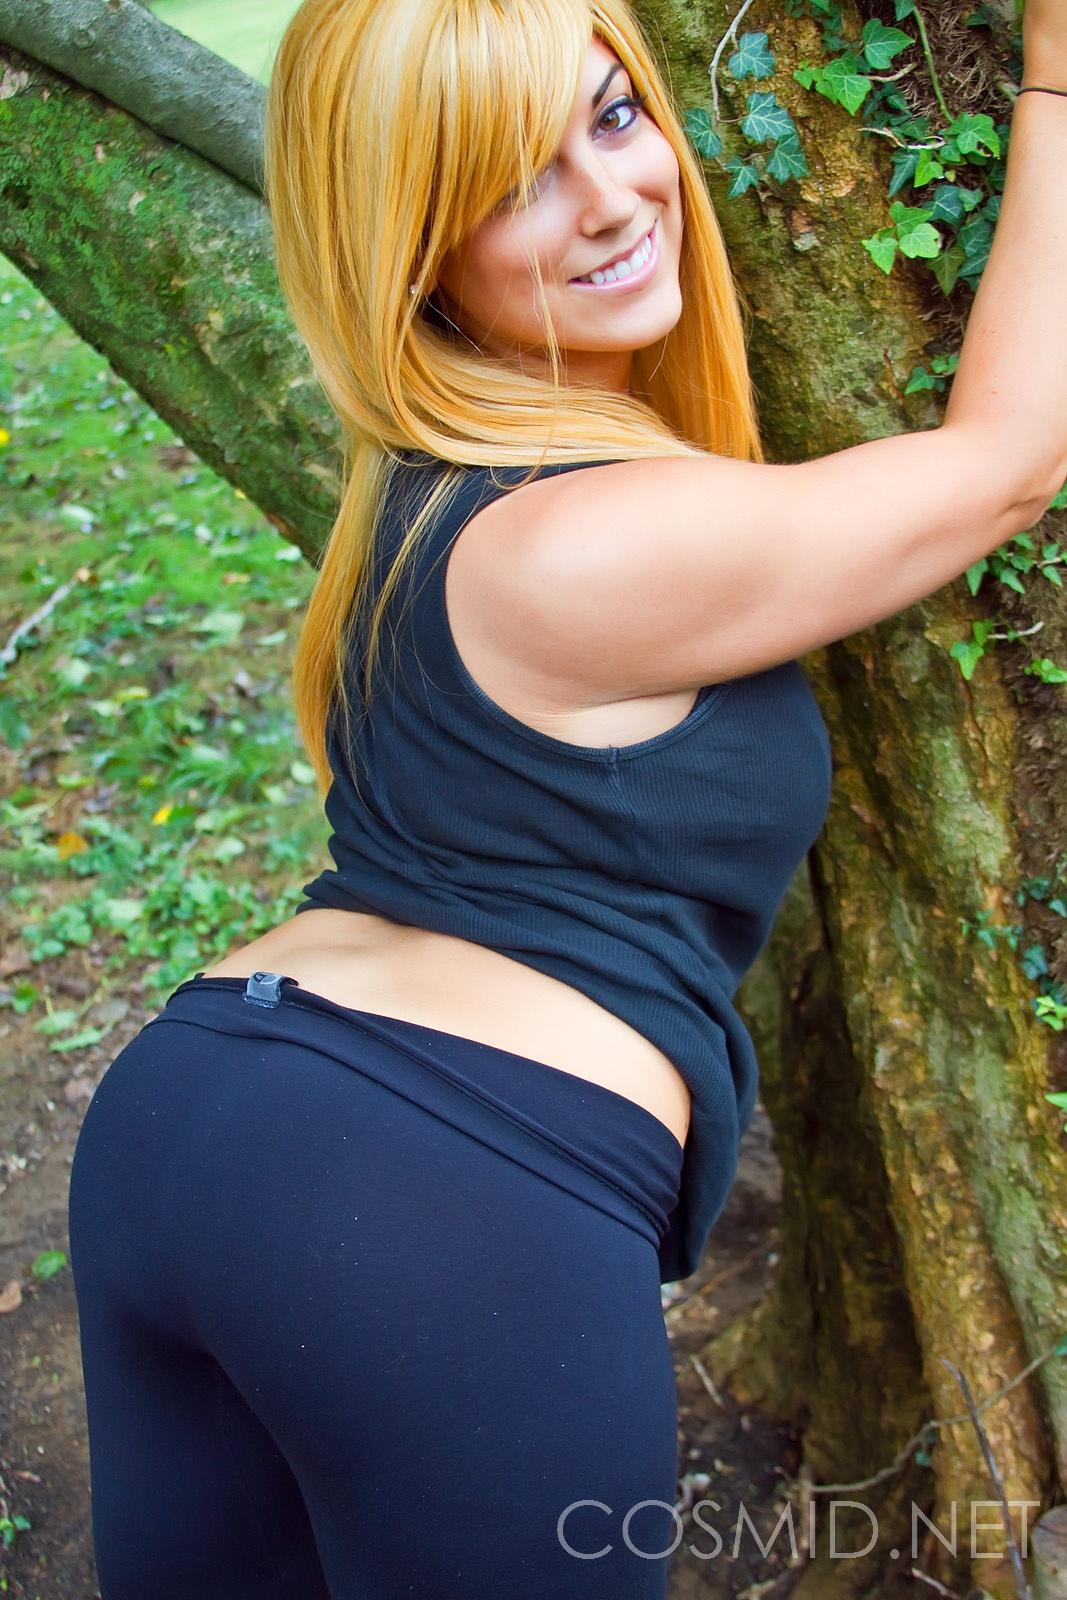 Natural hairy women having sex